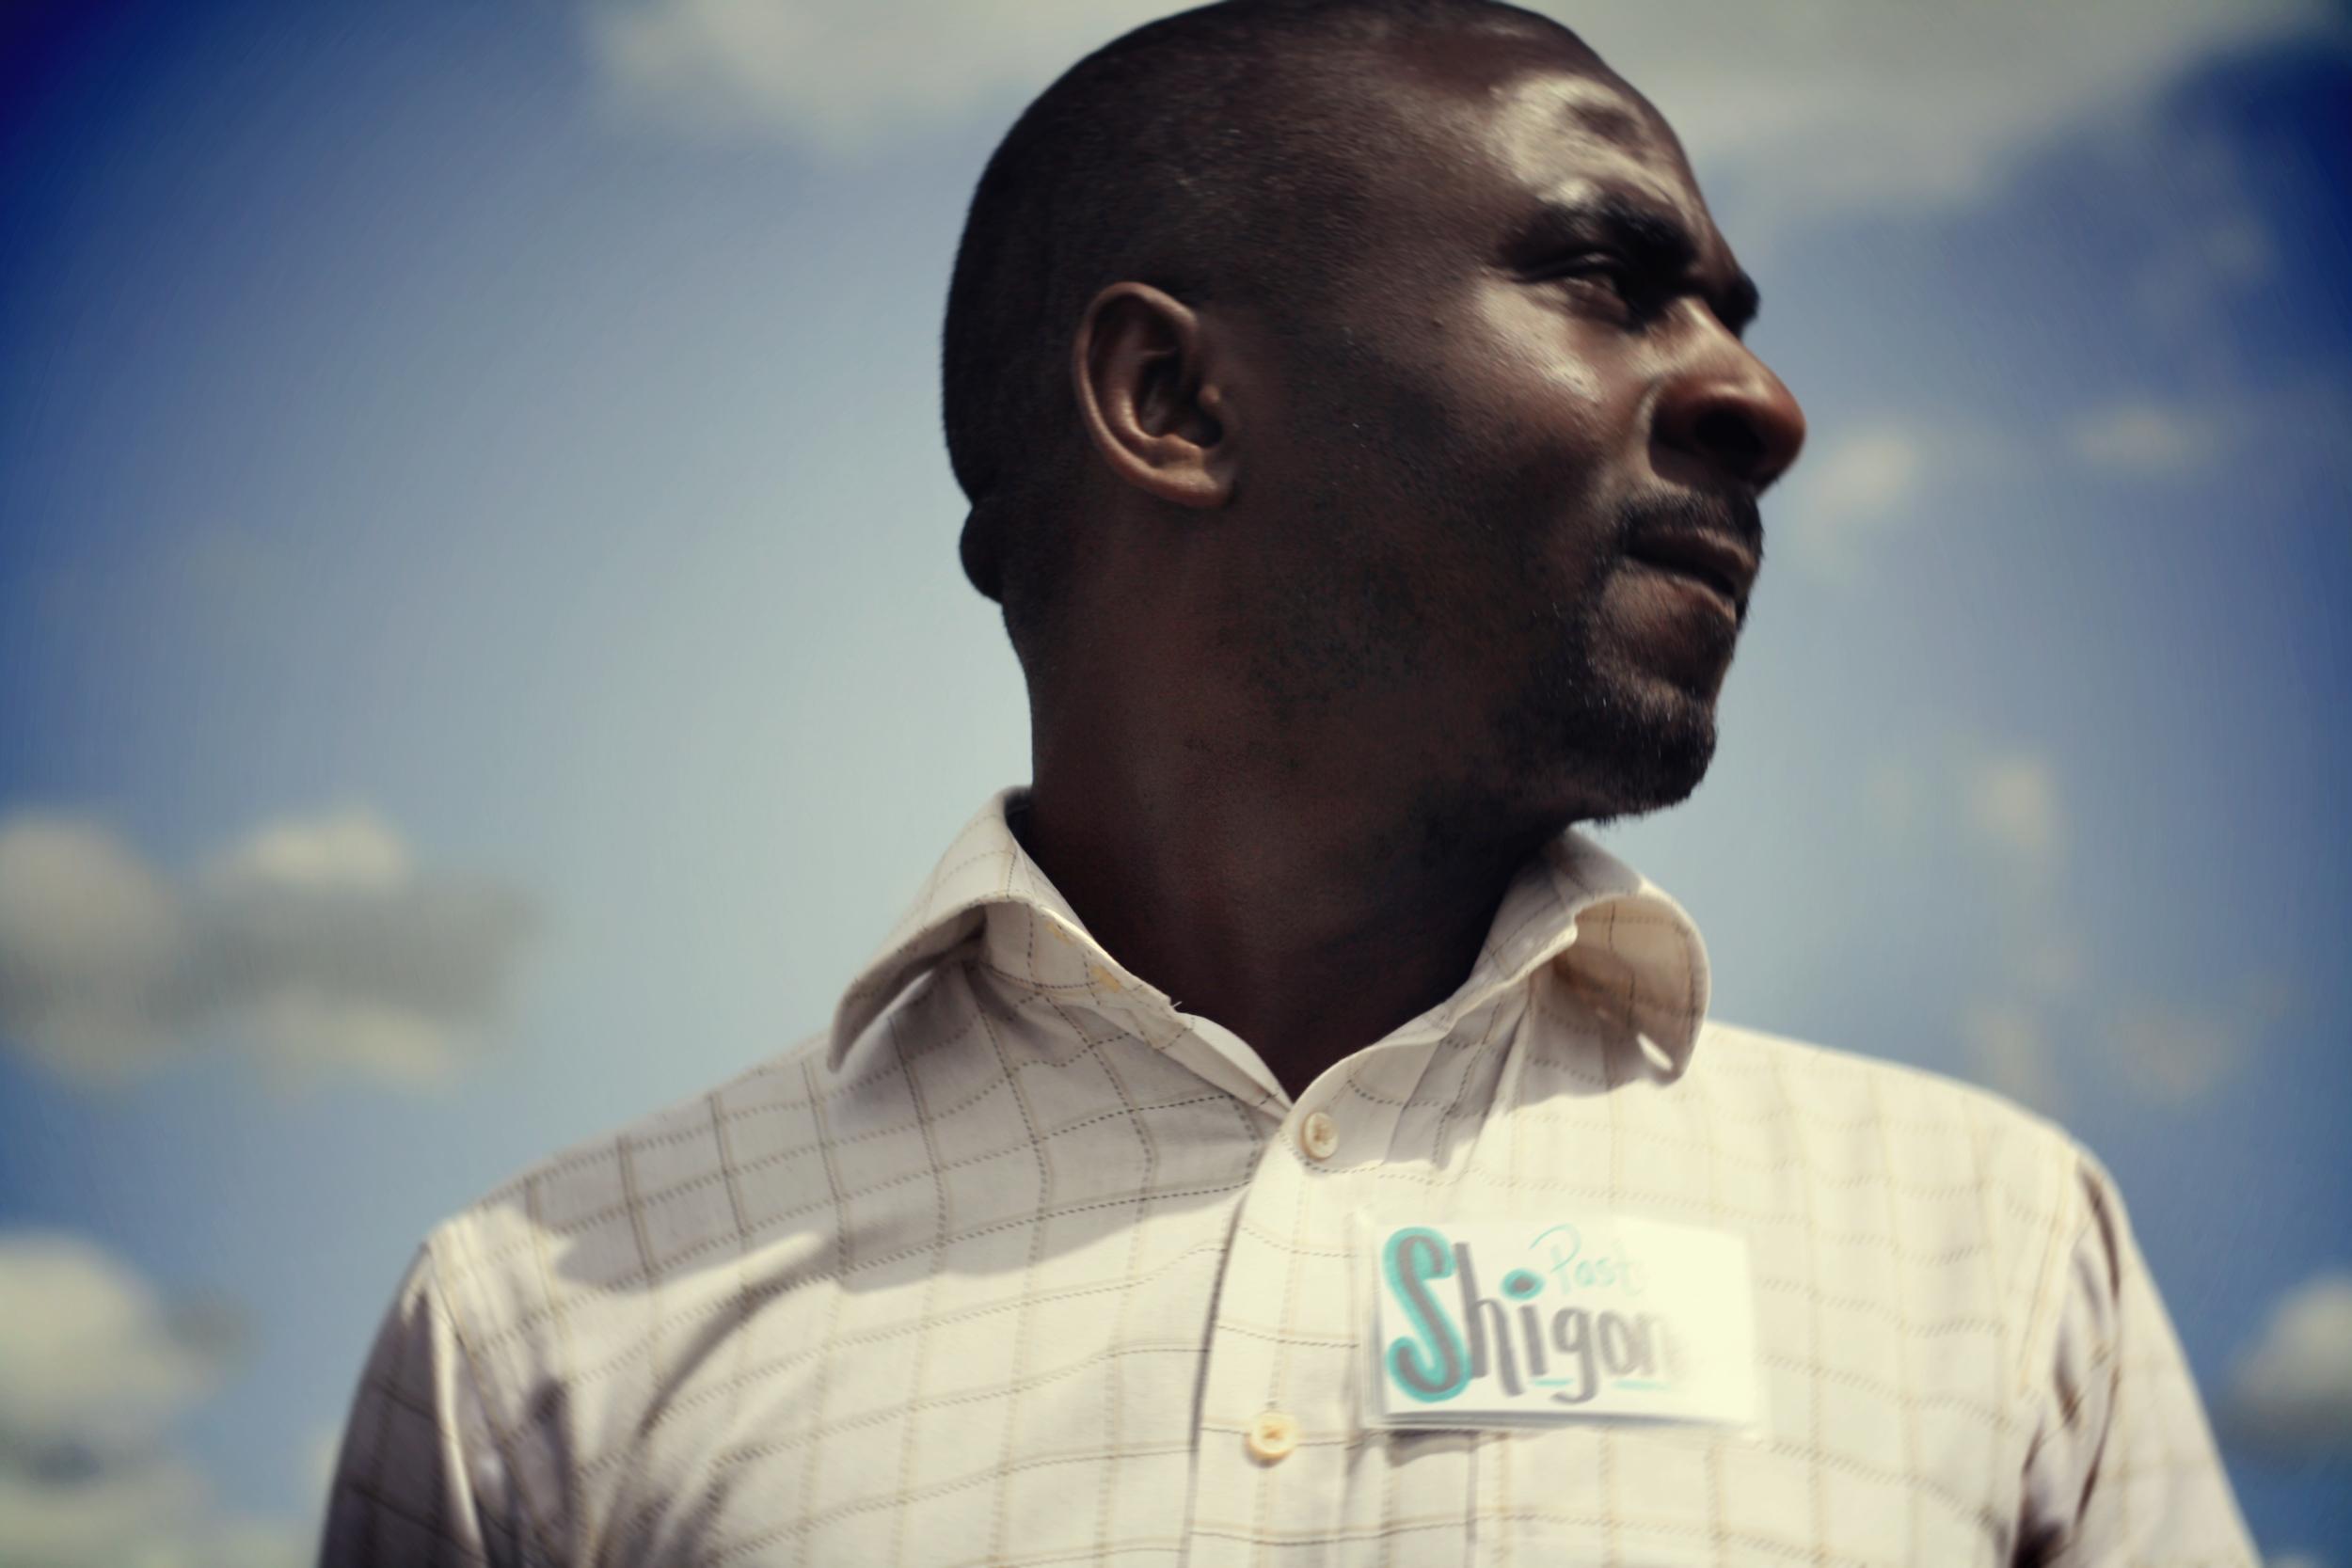 Pastor Shigonde, Kenyan leader of Maridhiano Ministries